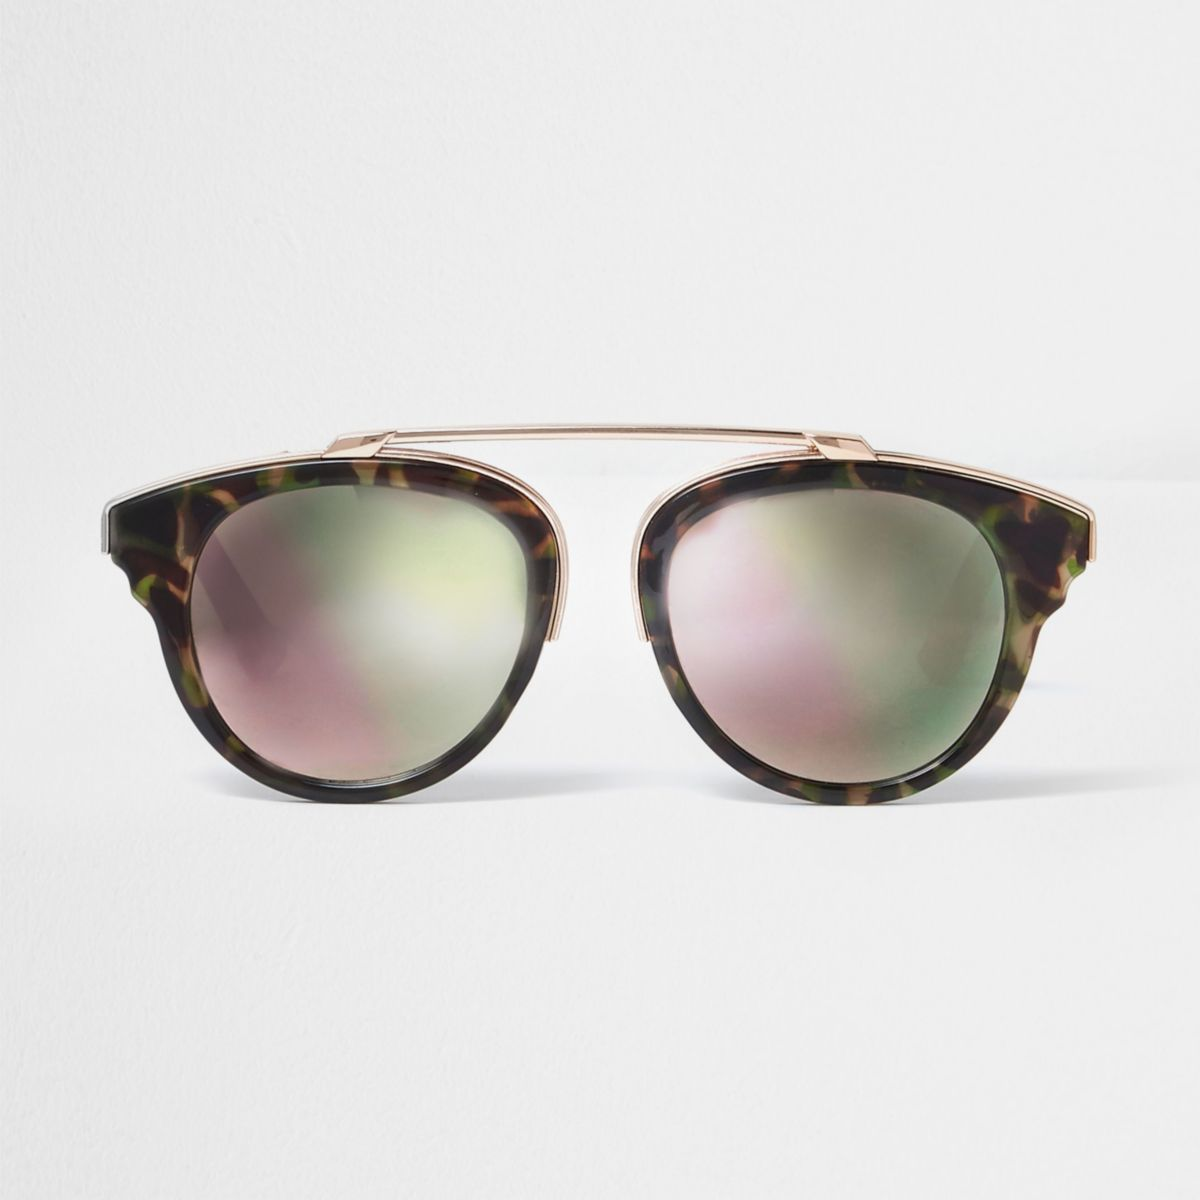 Brown camo print pink mirror sunglasses